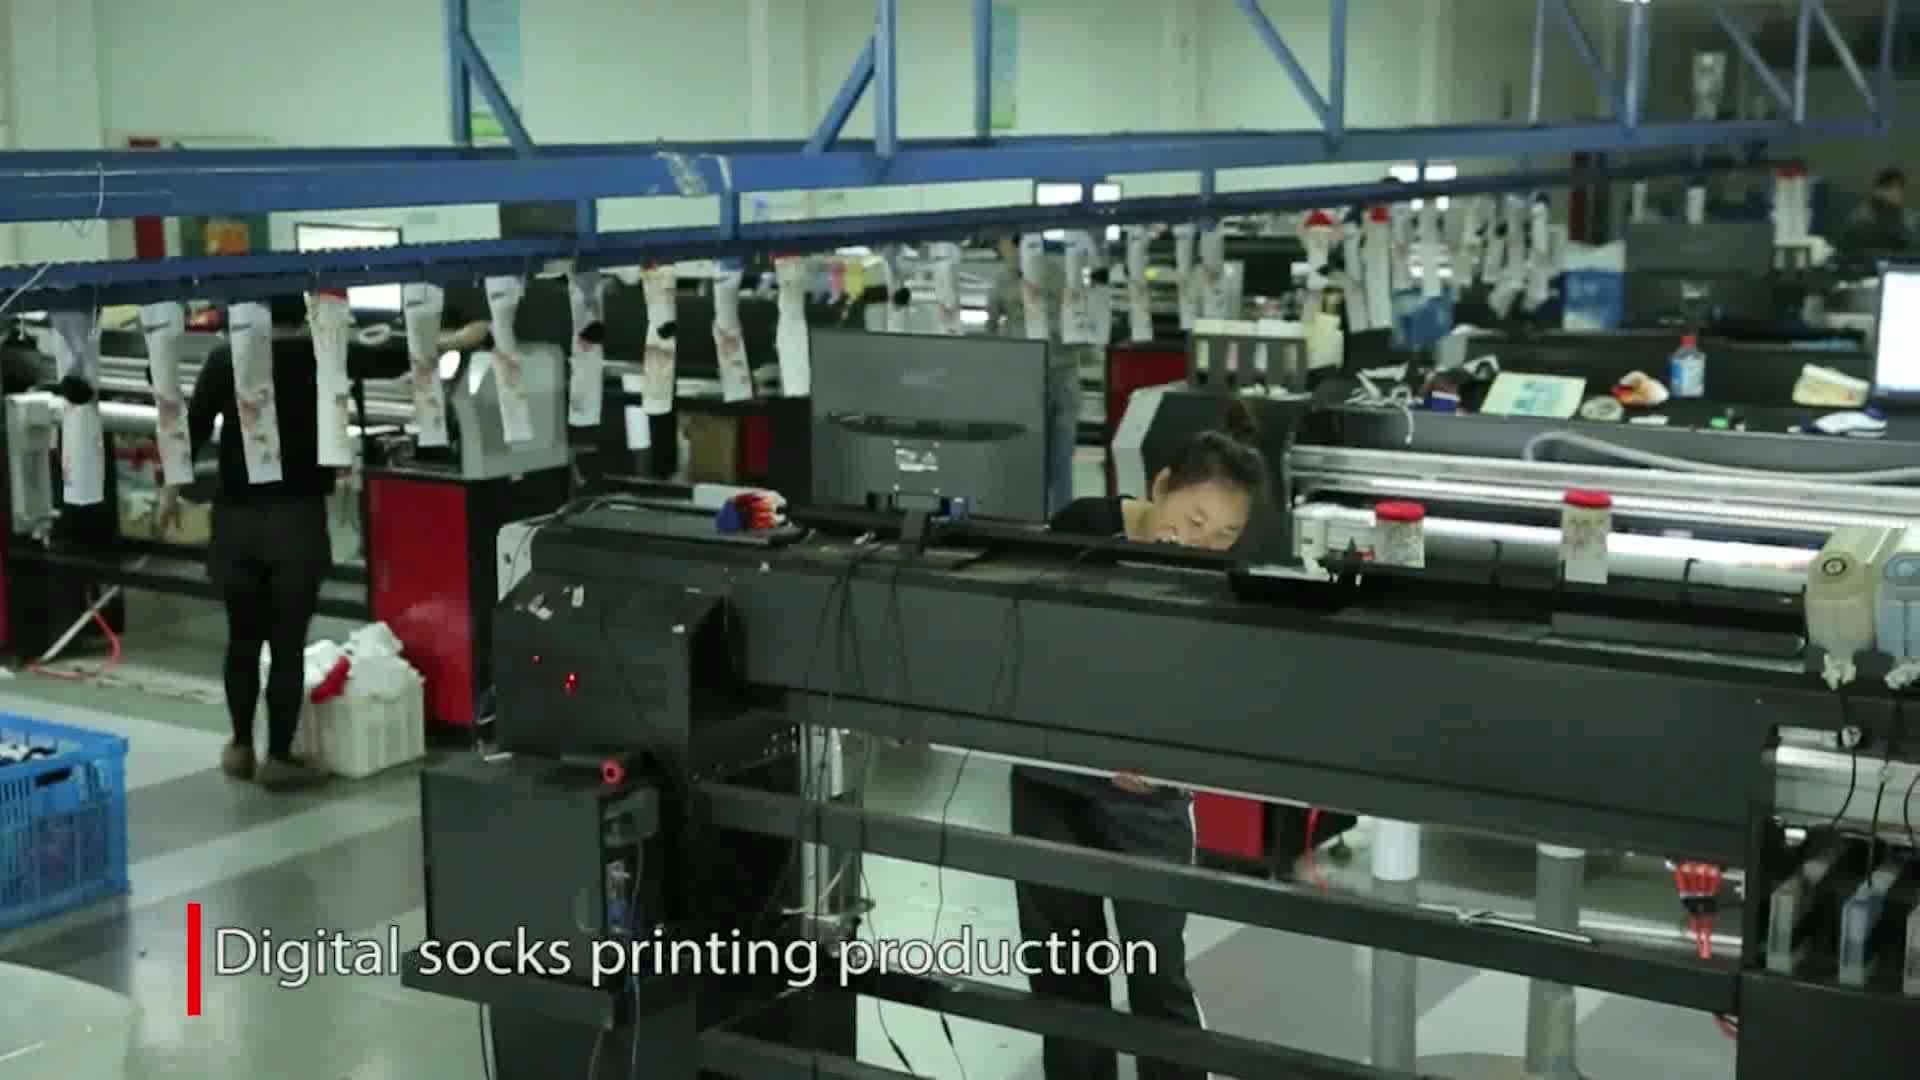 High Efficiency High Resolution 360 Degree Seamless Digital Textile Printer for Socks, Shorts, Bra, Underwear